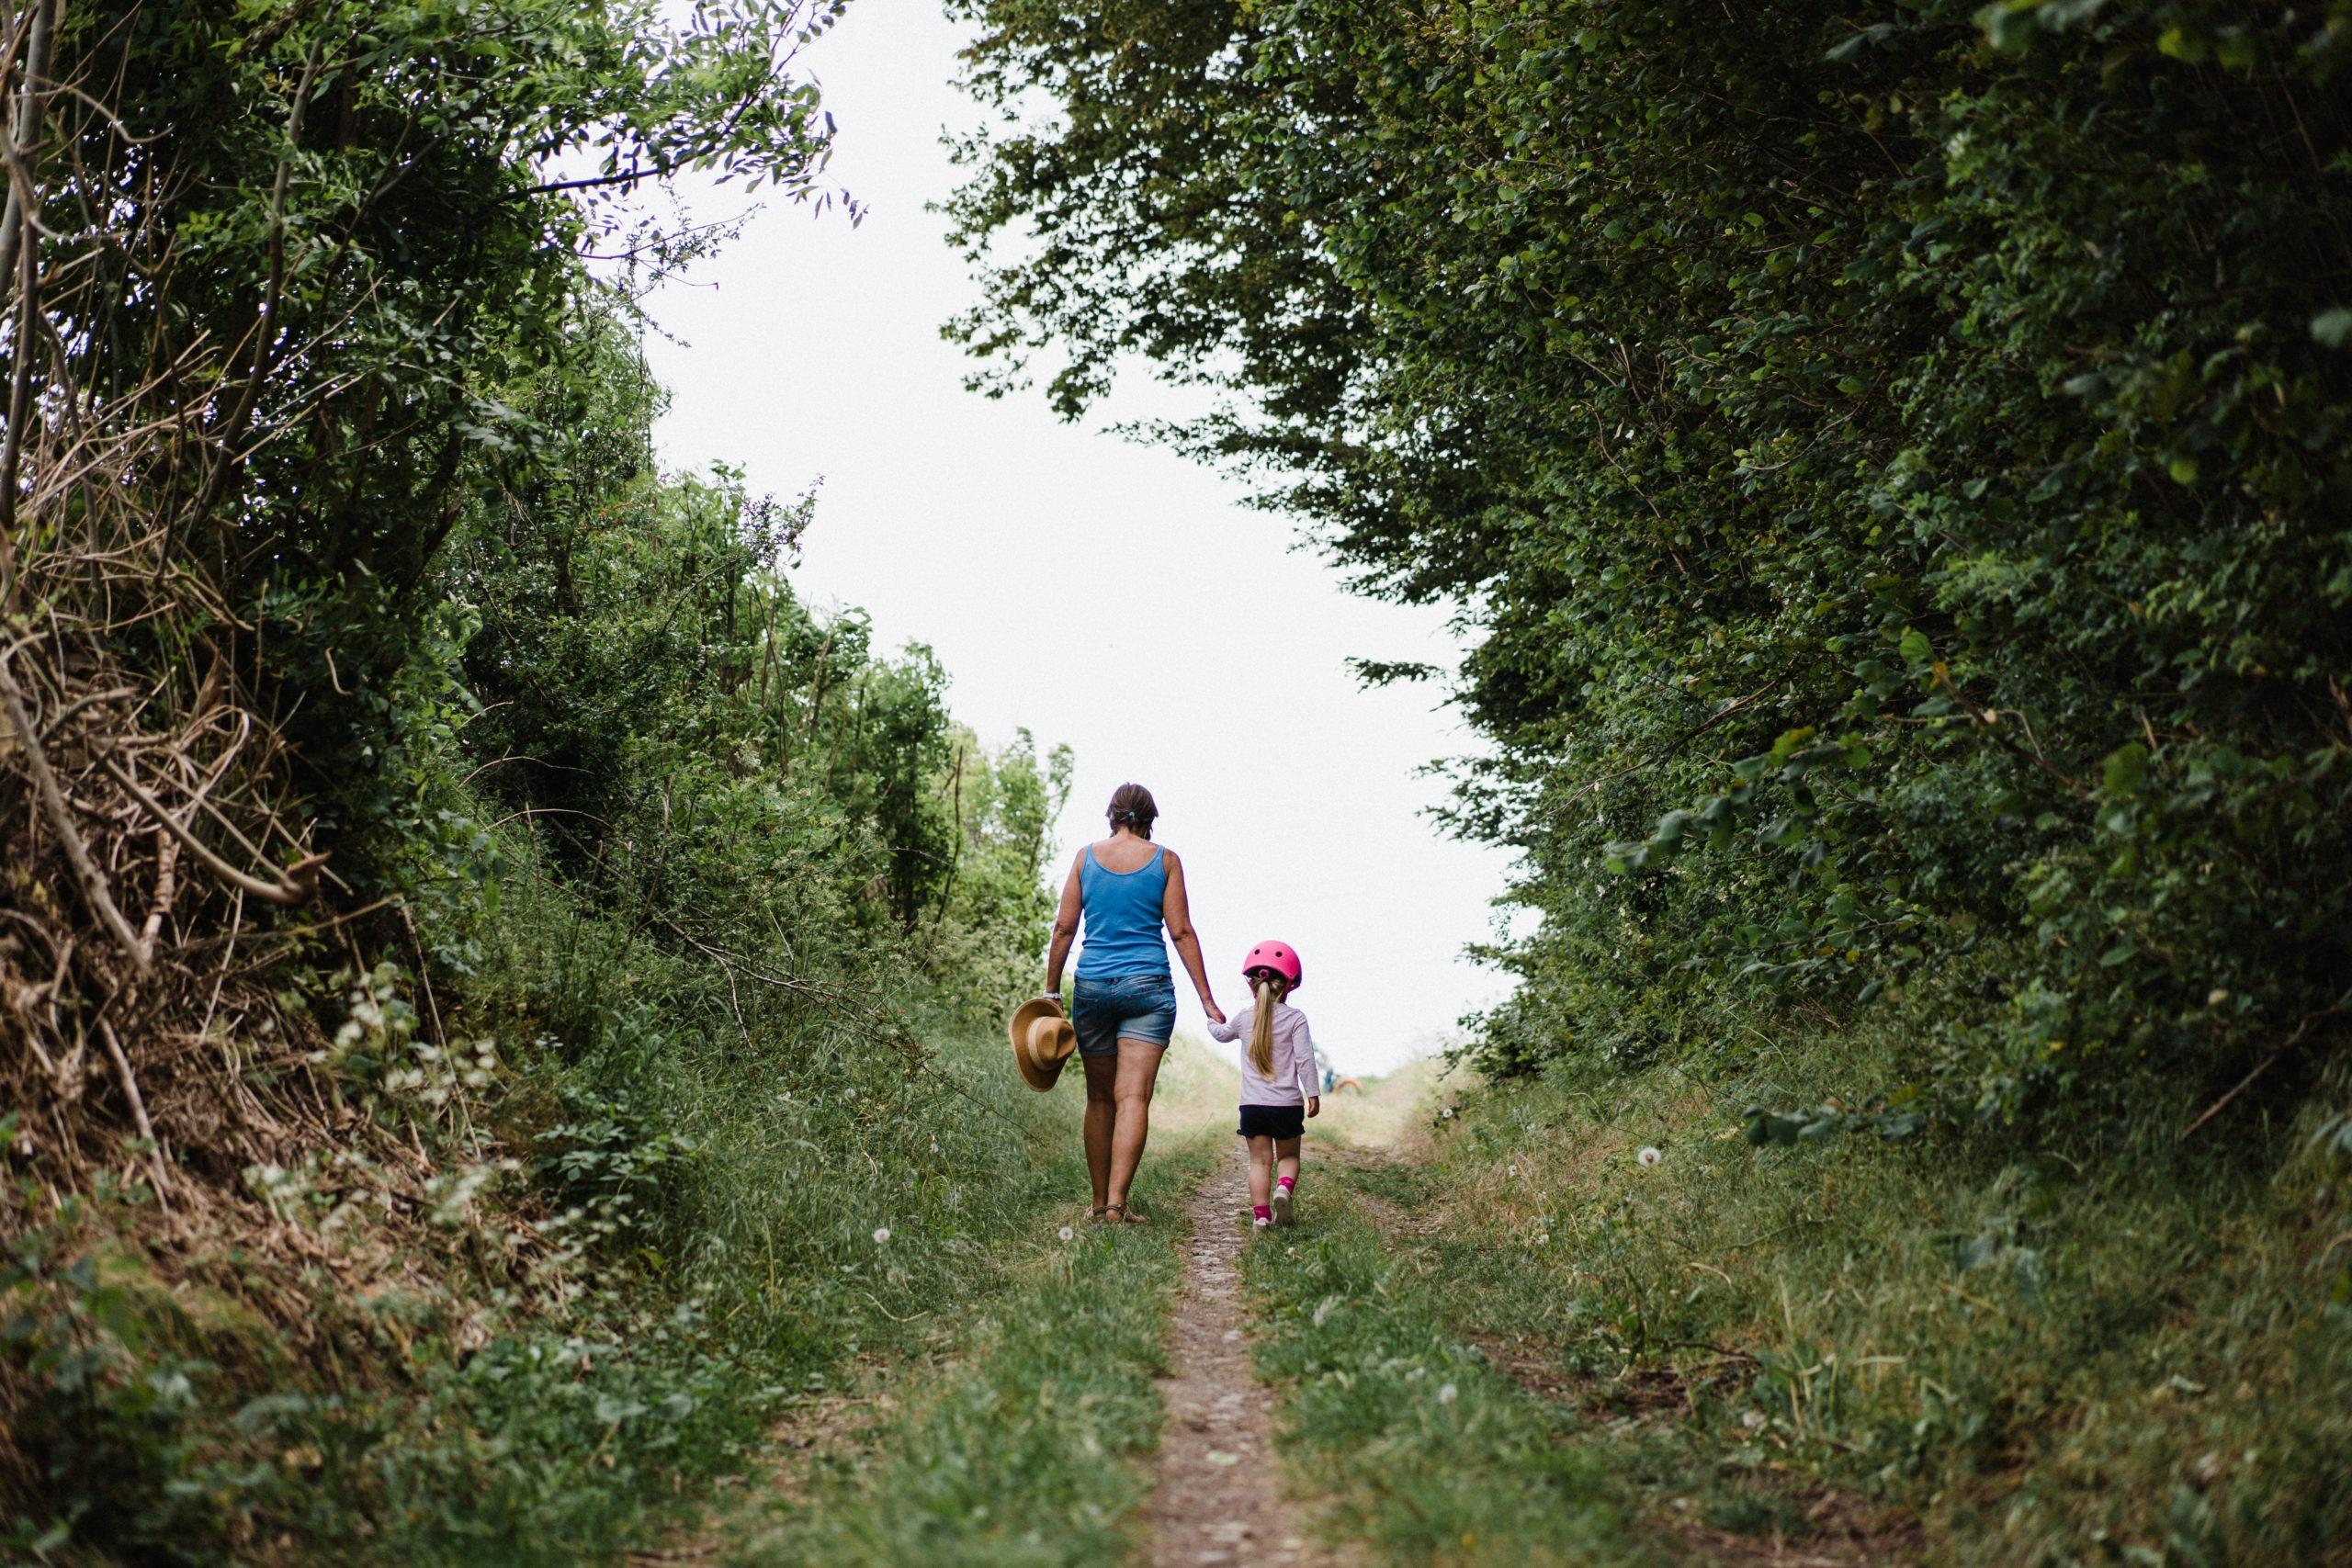 Promenade dans la campagne de Sombreffe 19